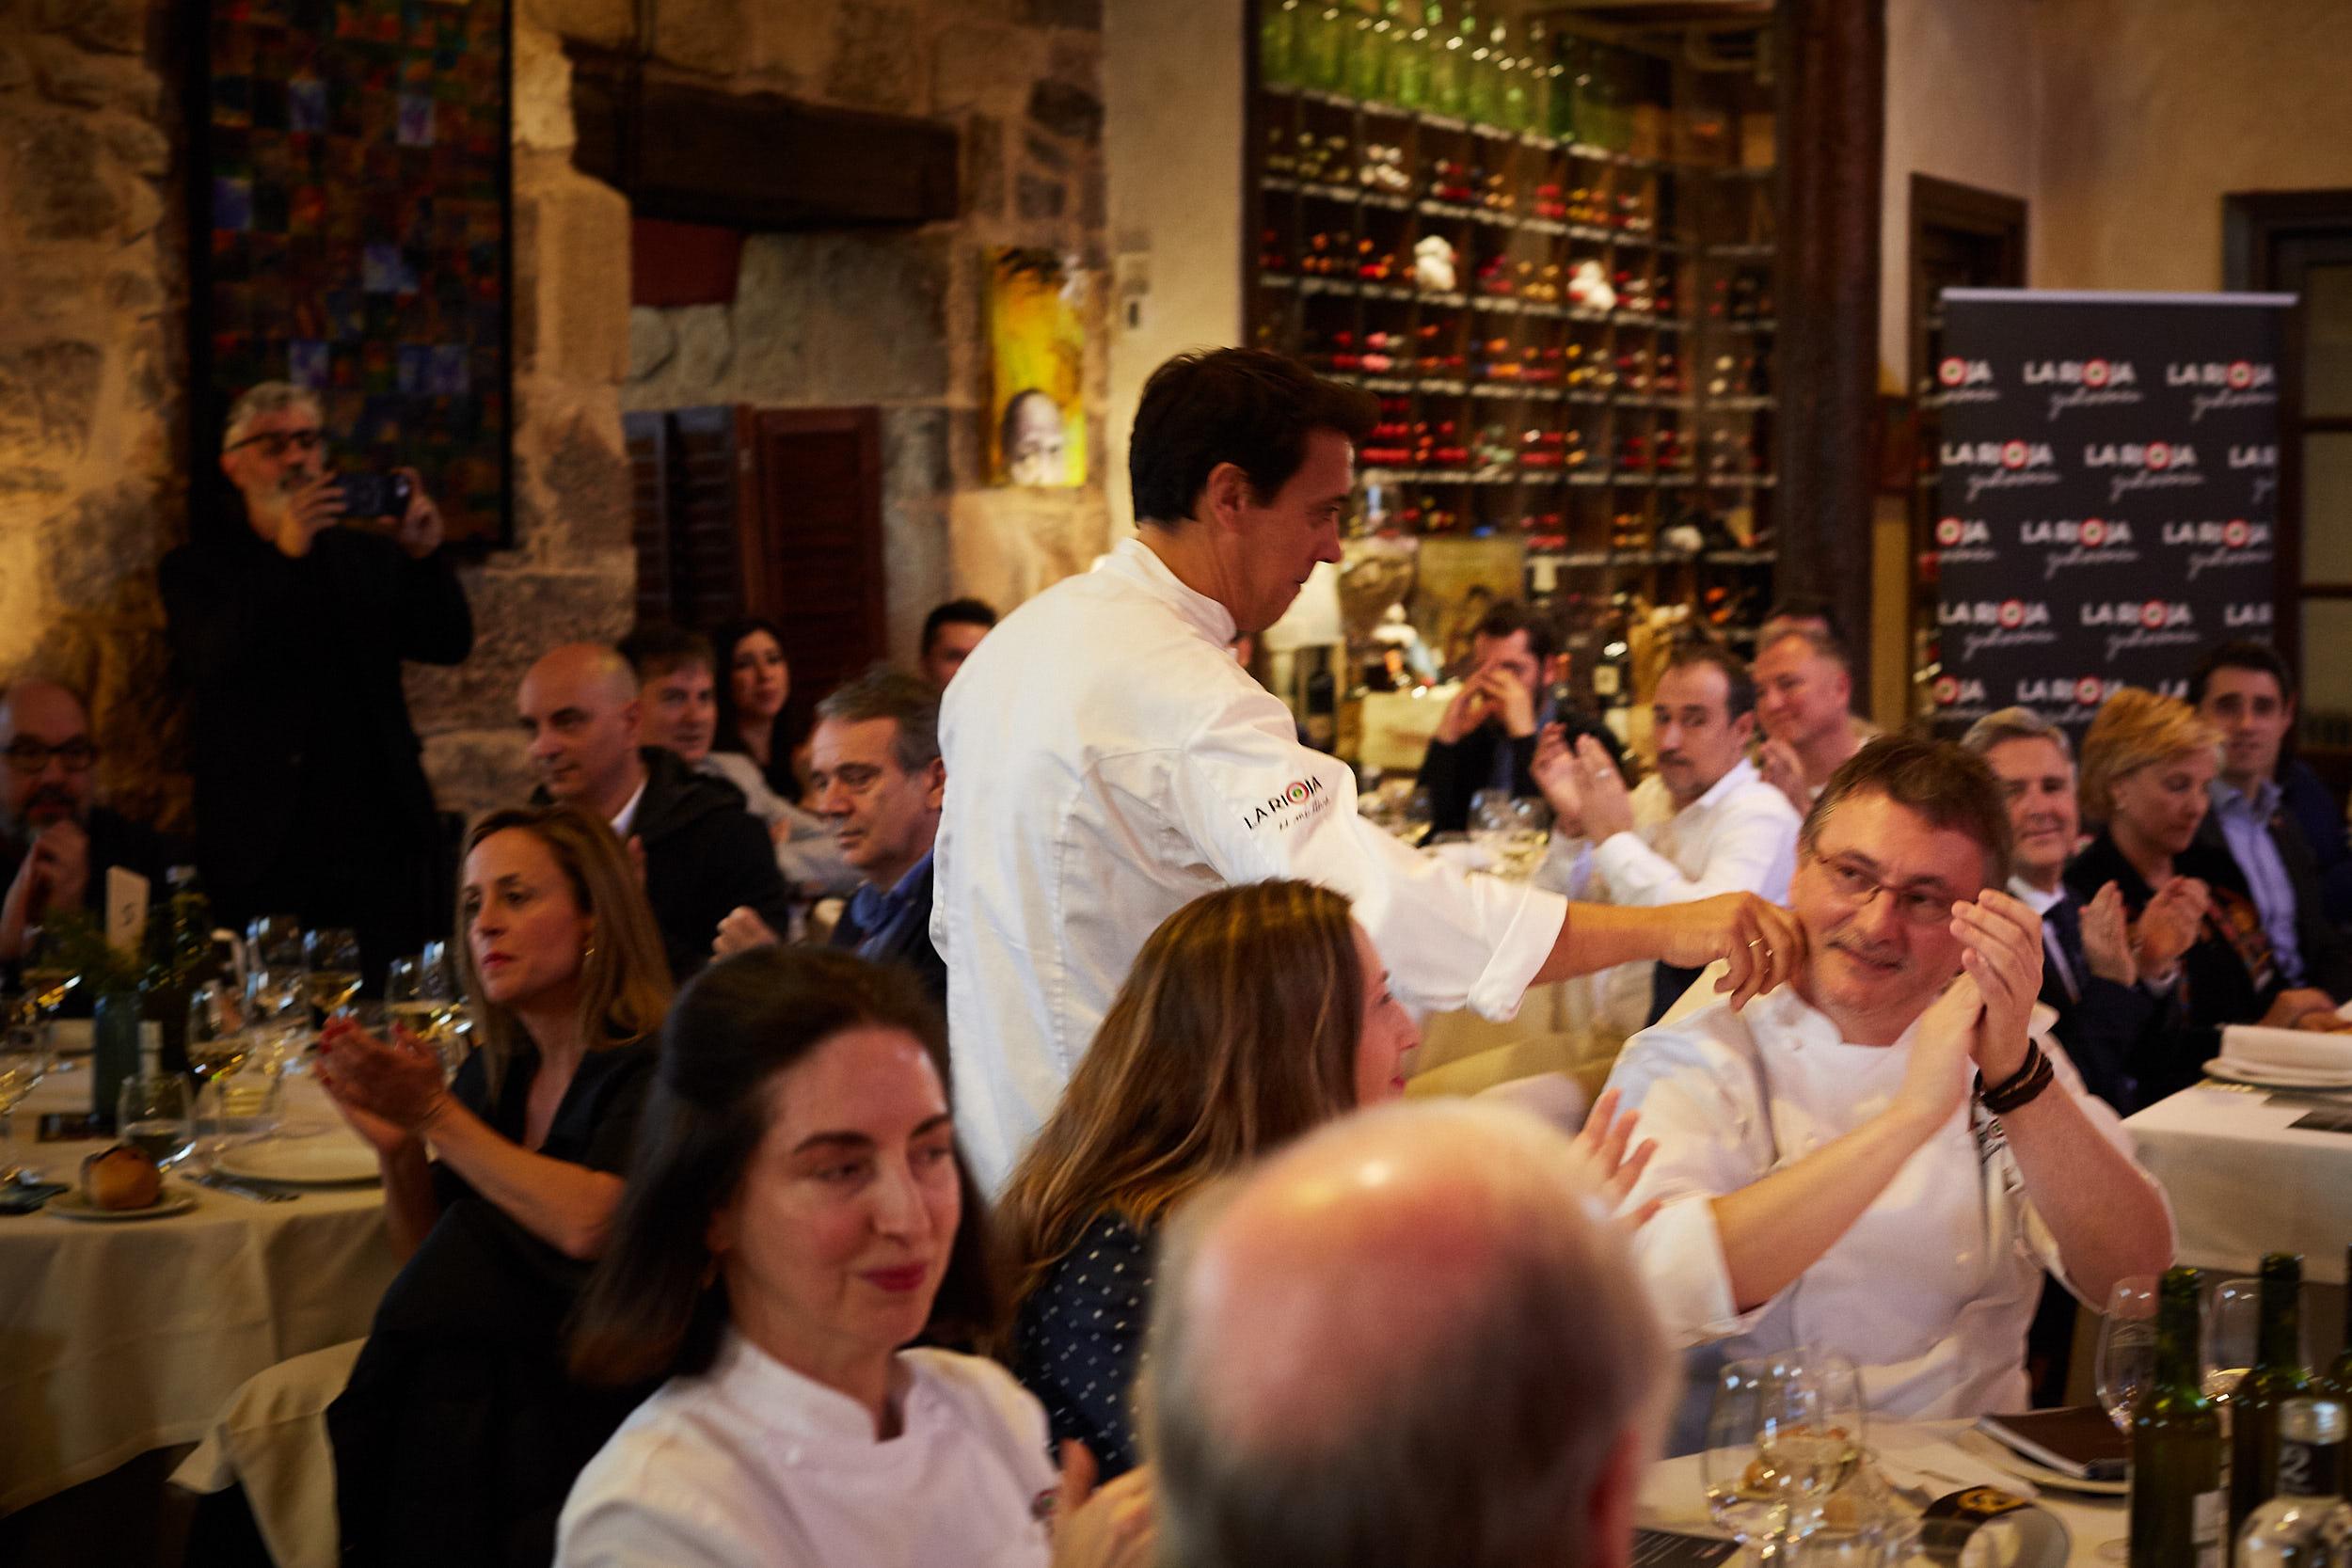 1903Restaurante_La_Vieja_Bodega_Casalarreina_La_Rioja_Spain_Sturcke_0007.jpg